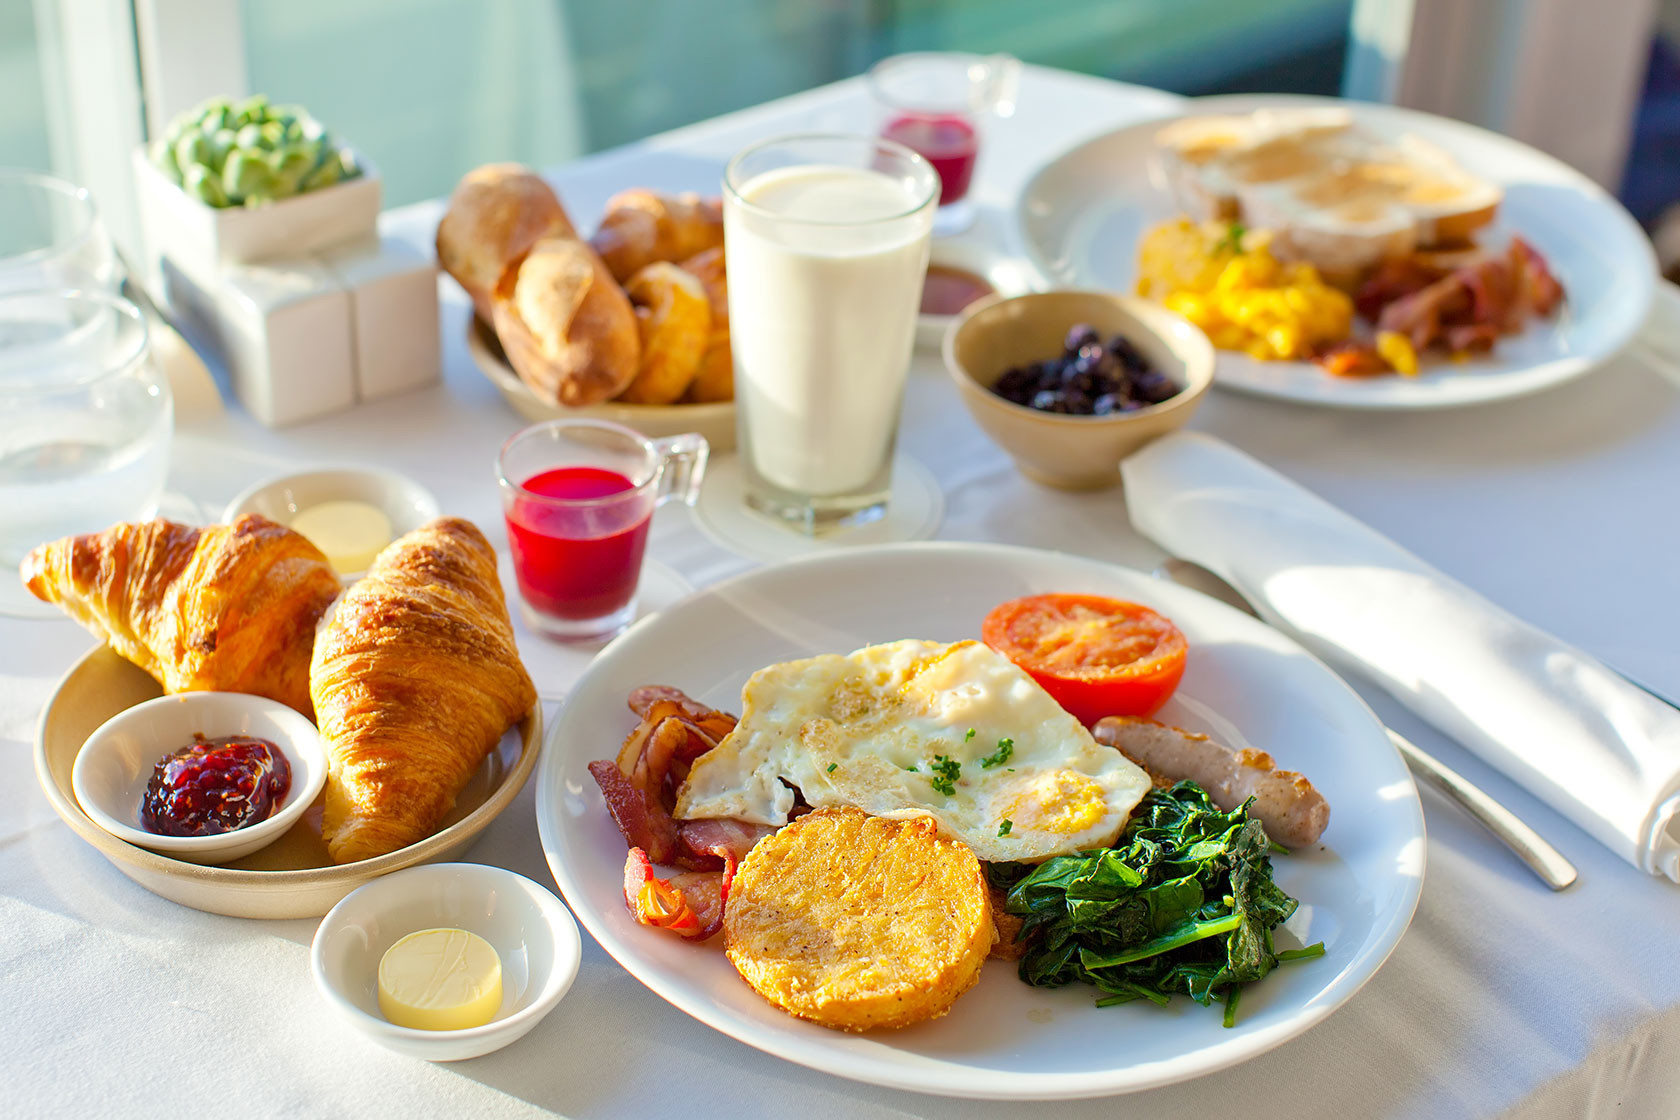 A Healthy Breakfast  Should You Skip Breakfast For Faster Fat Loss